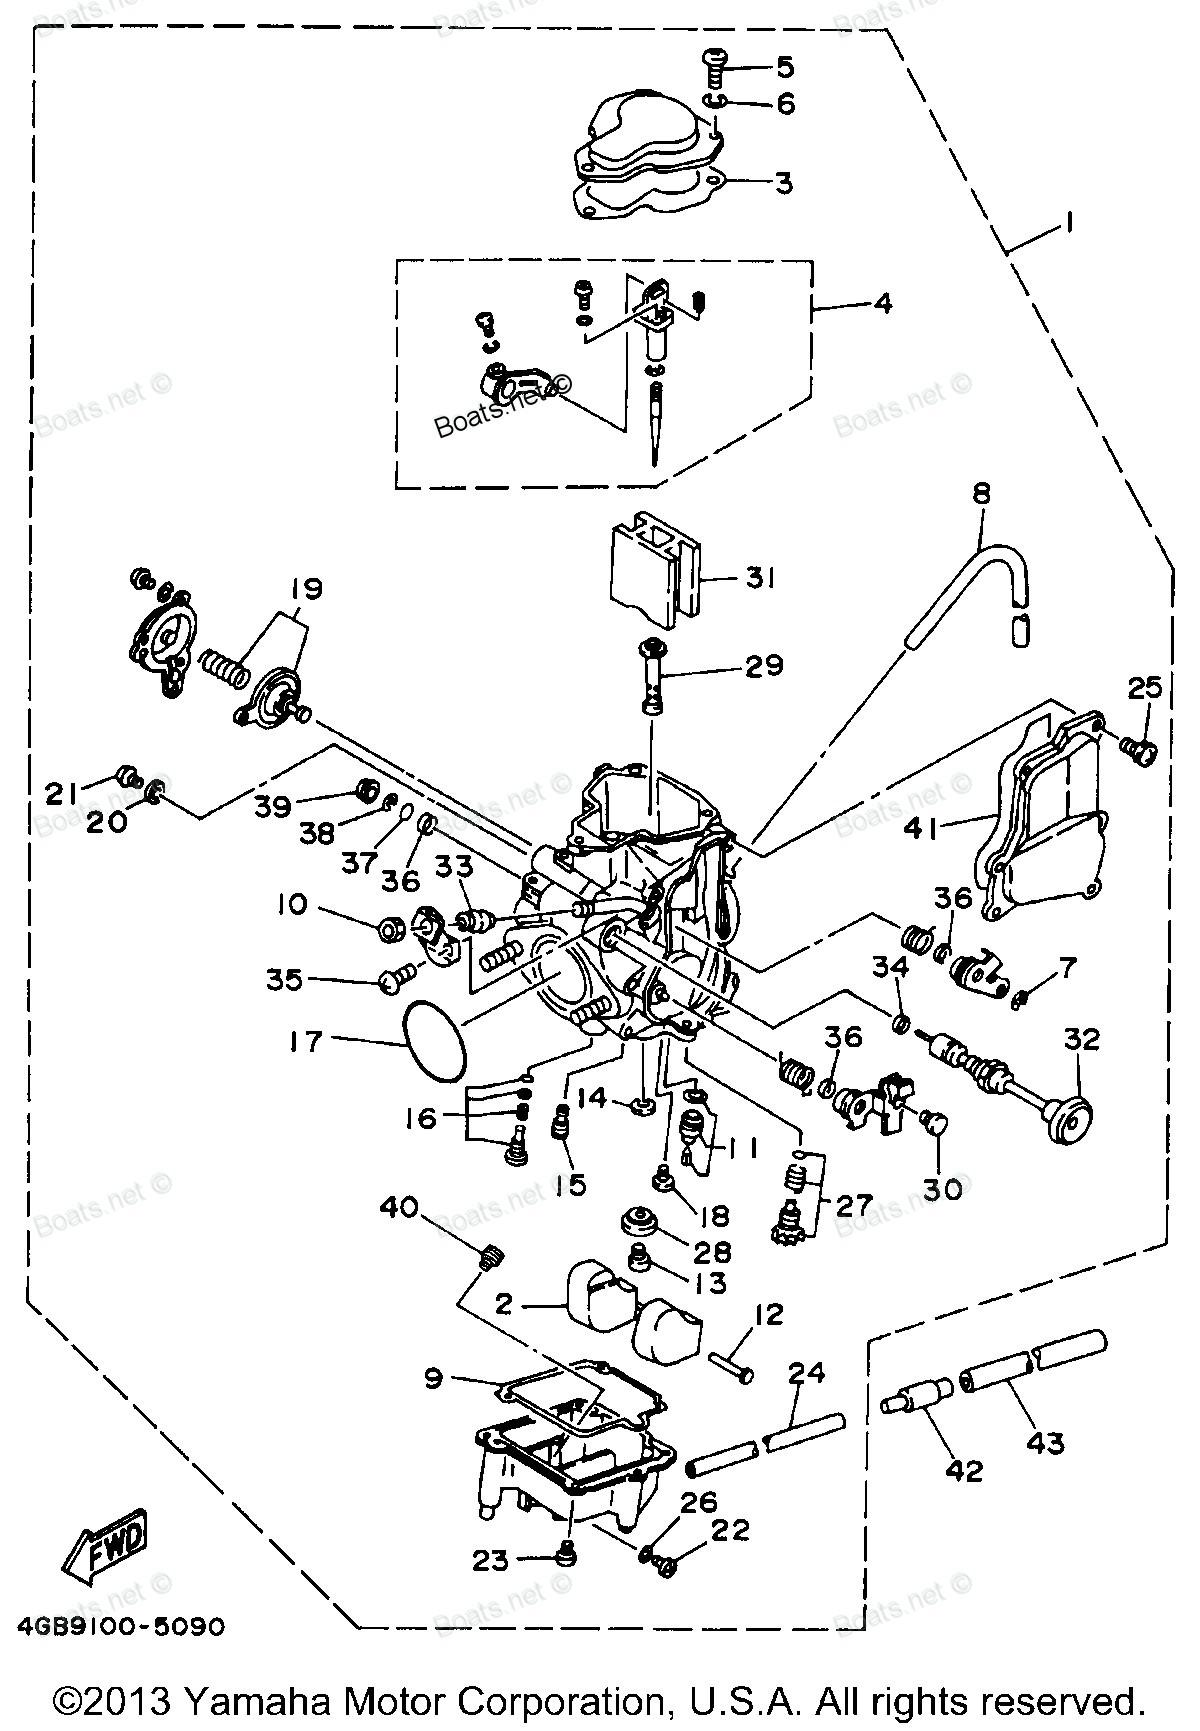 350 engine firing order diagram chevy wiring diagrams  u2013 my